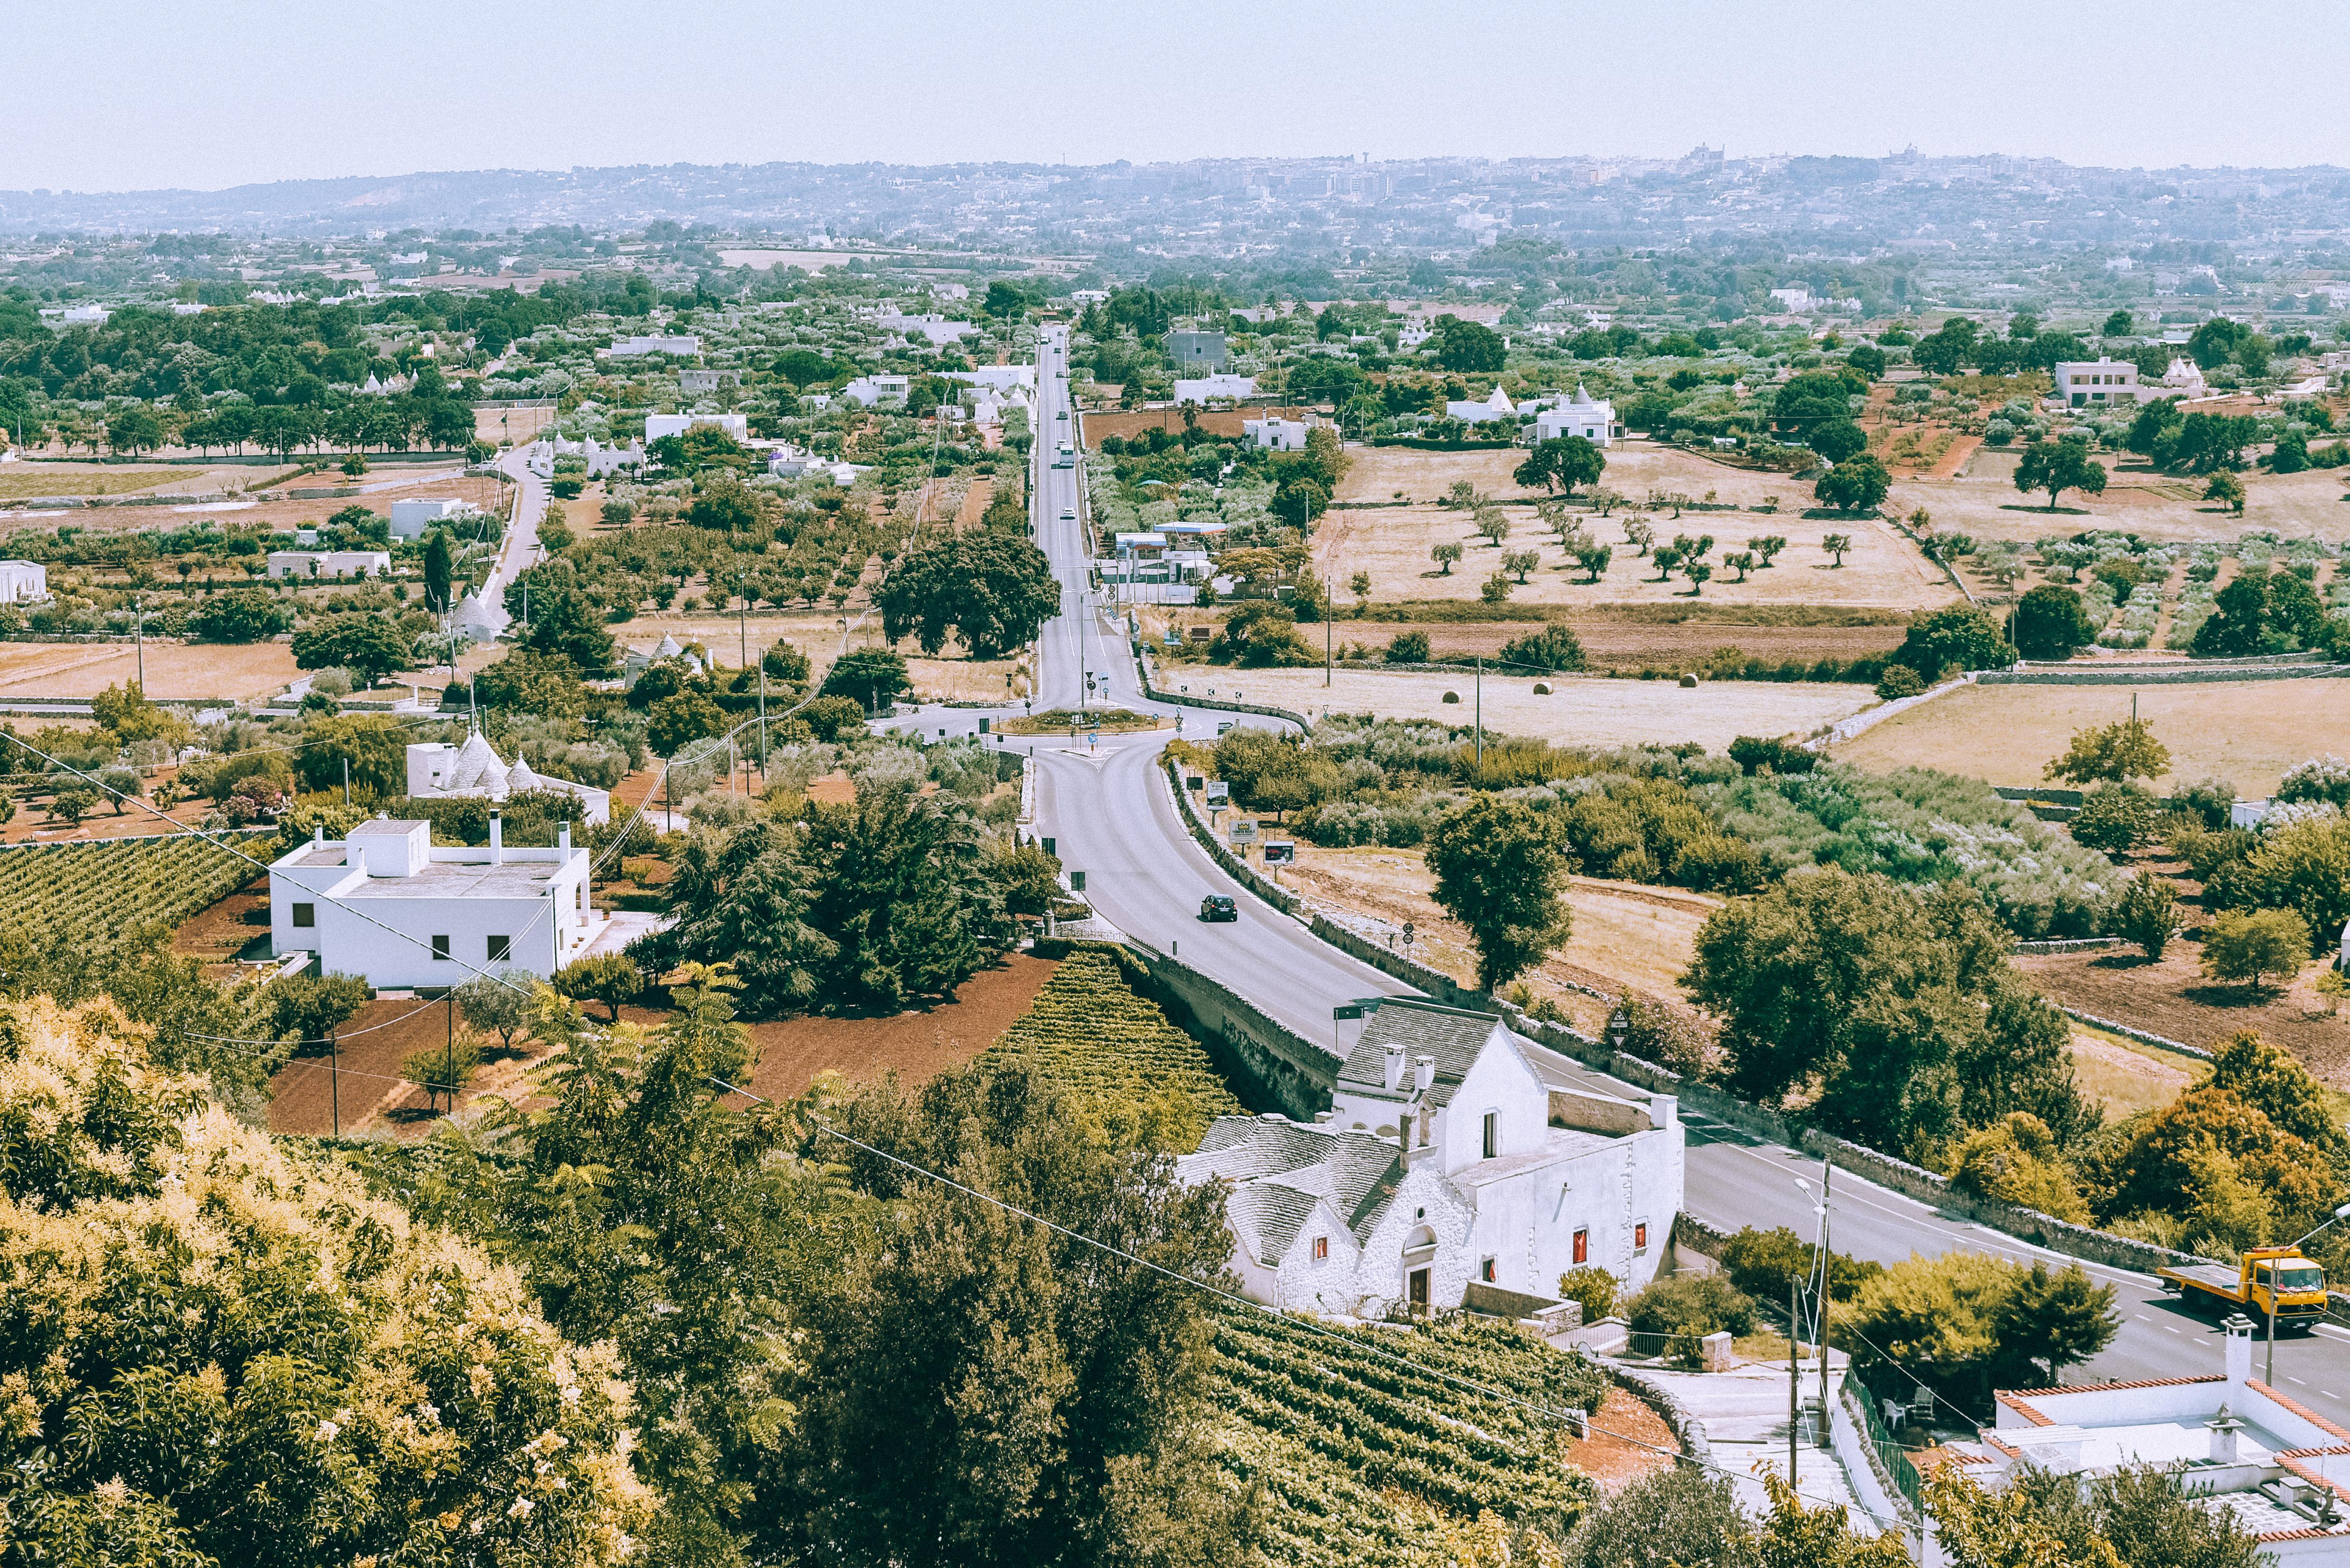 Widok z Villa Comunale Giuseppe Garibaldi